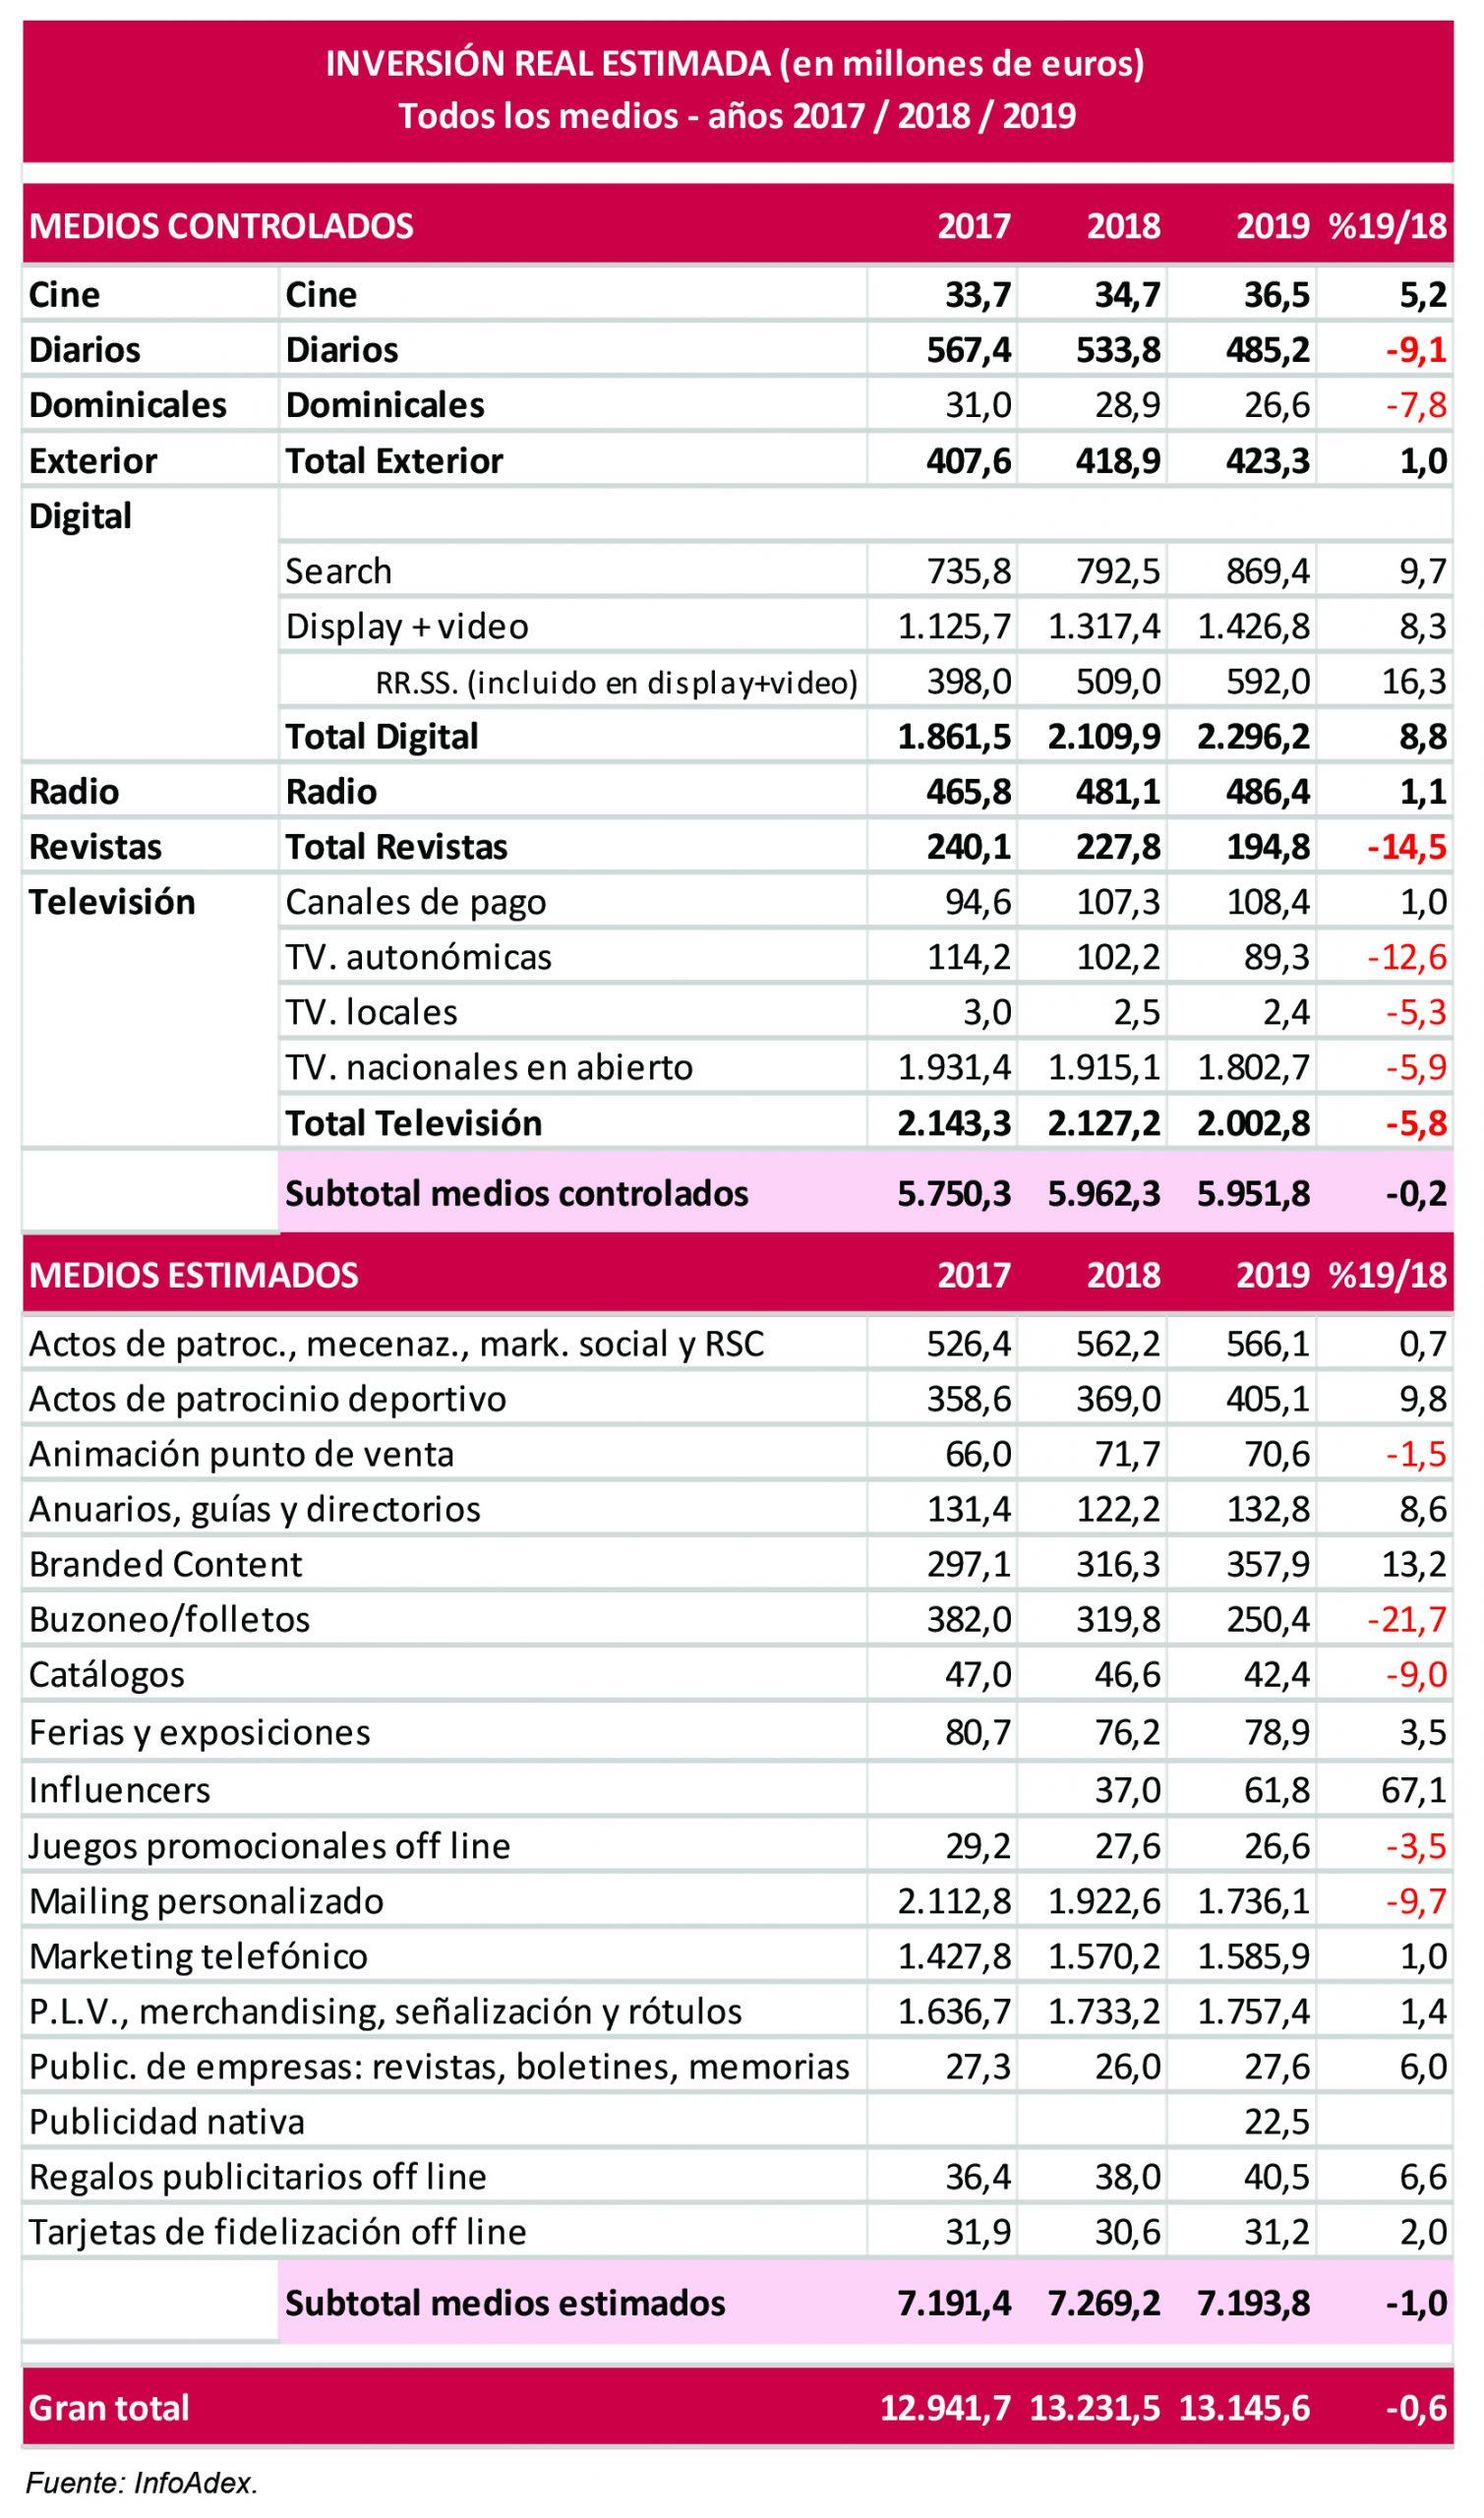 inversion publicitaria en espana